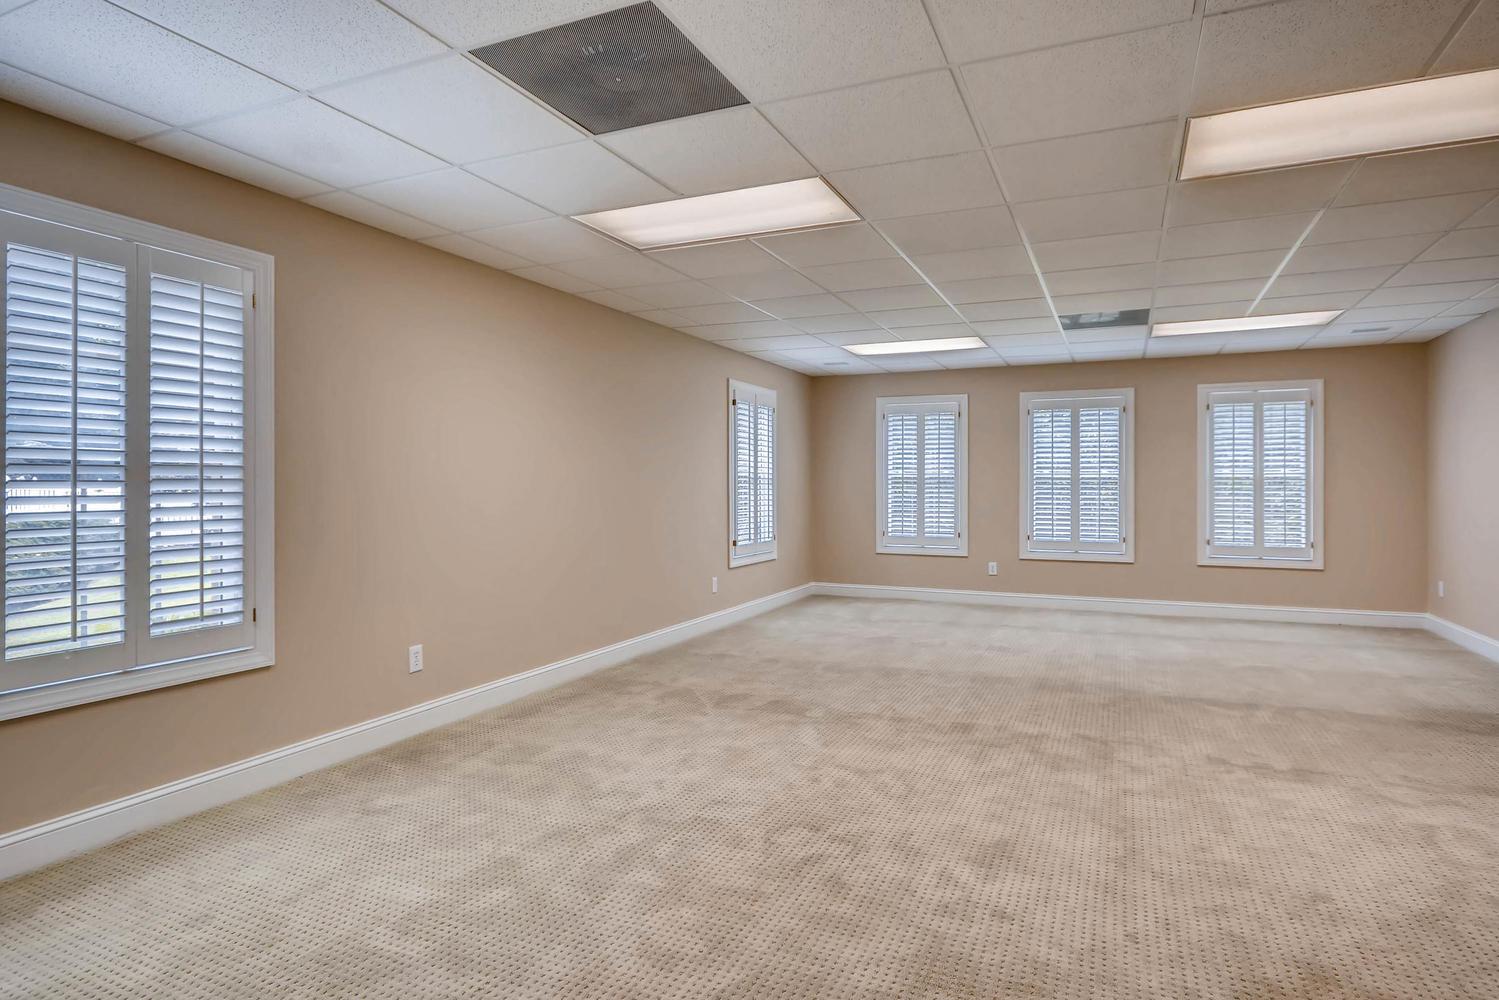 Photo of 320 Broadmoor Way, McDonough, GA, 30253